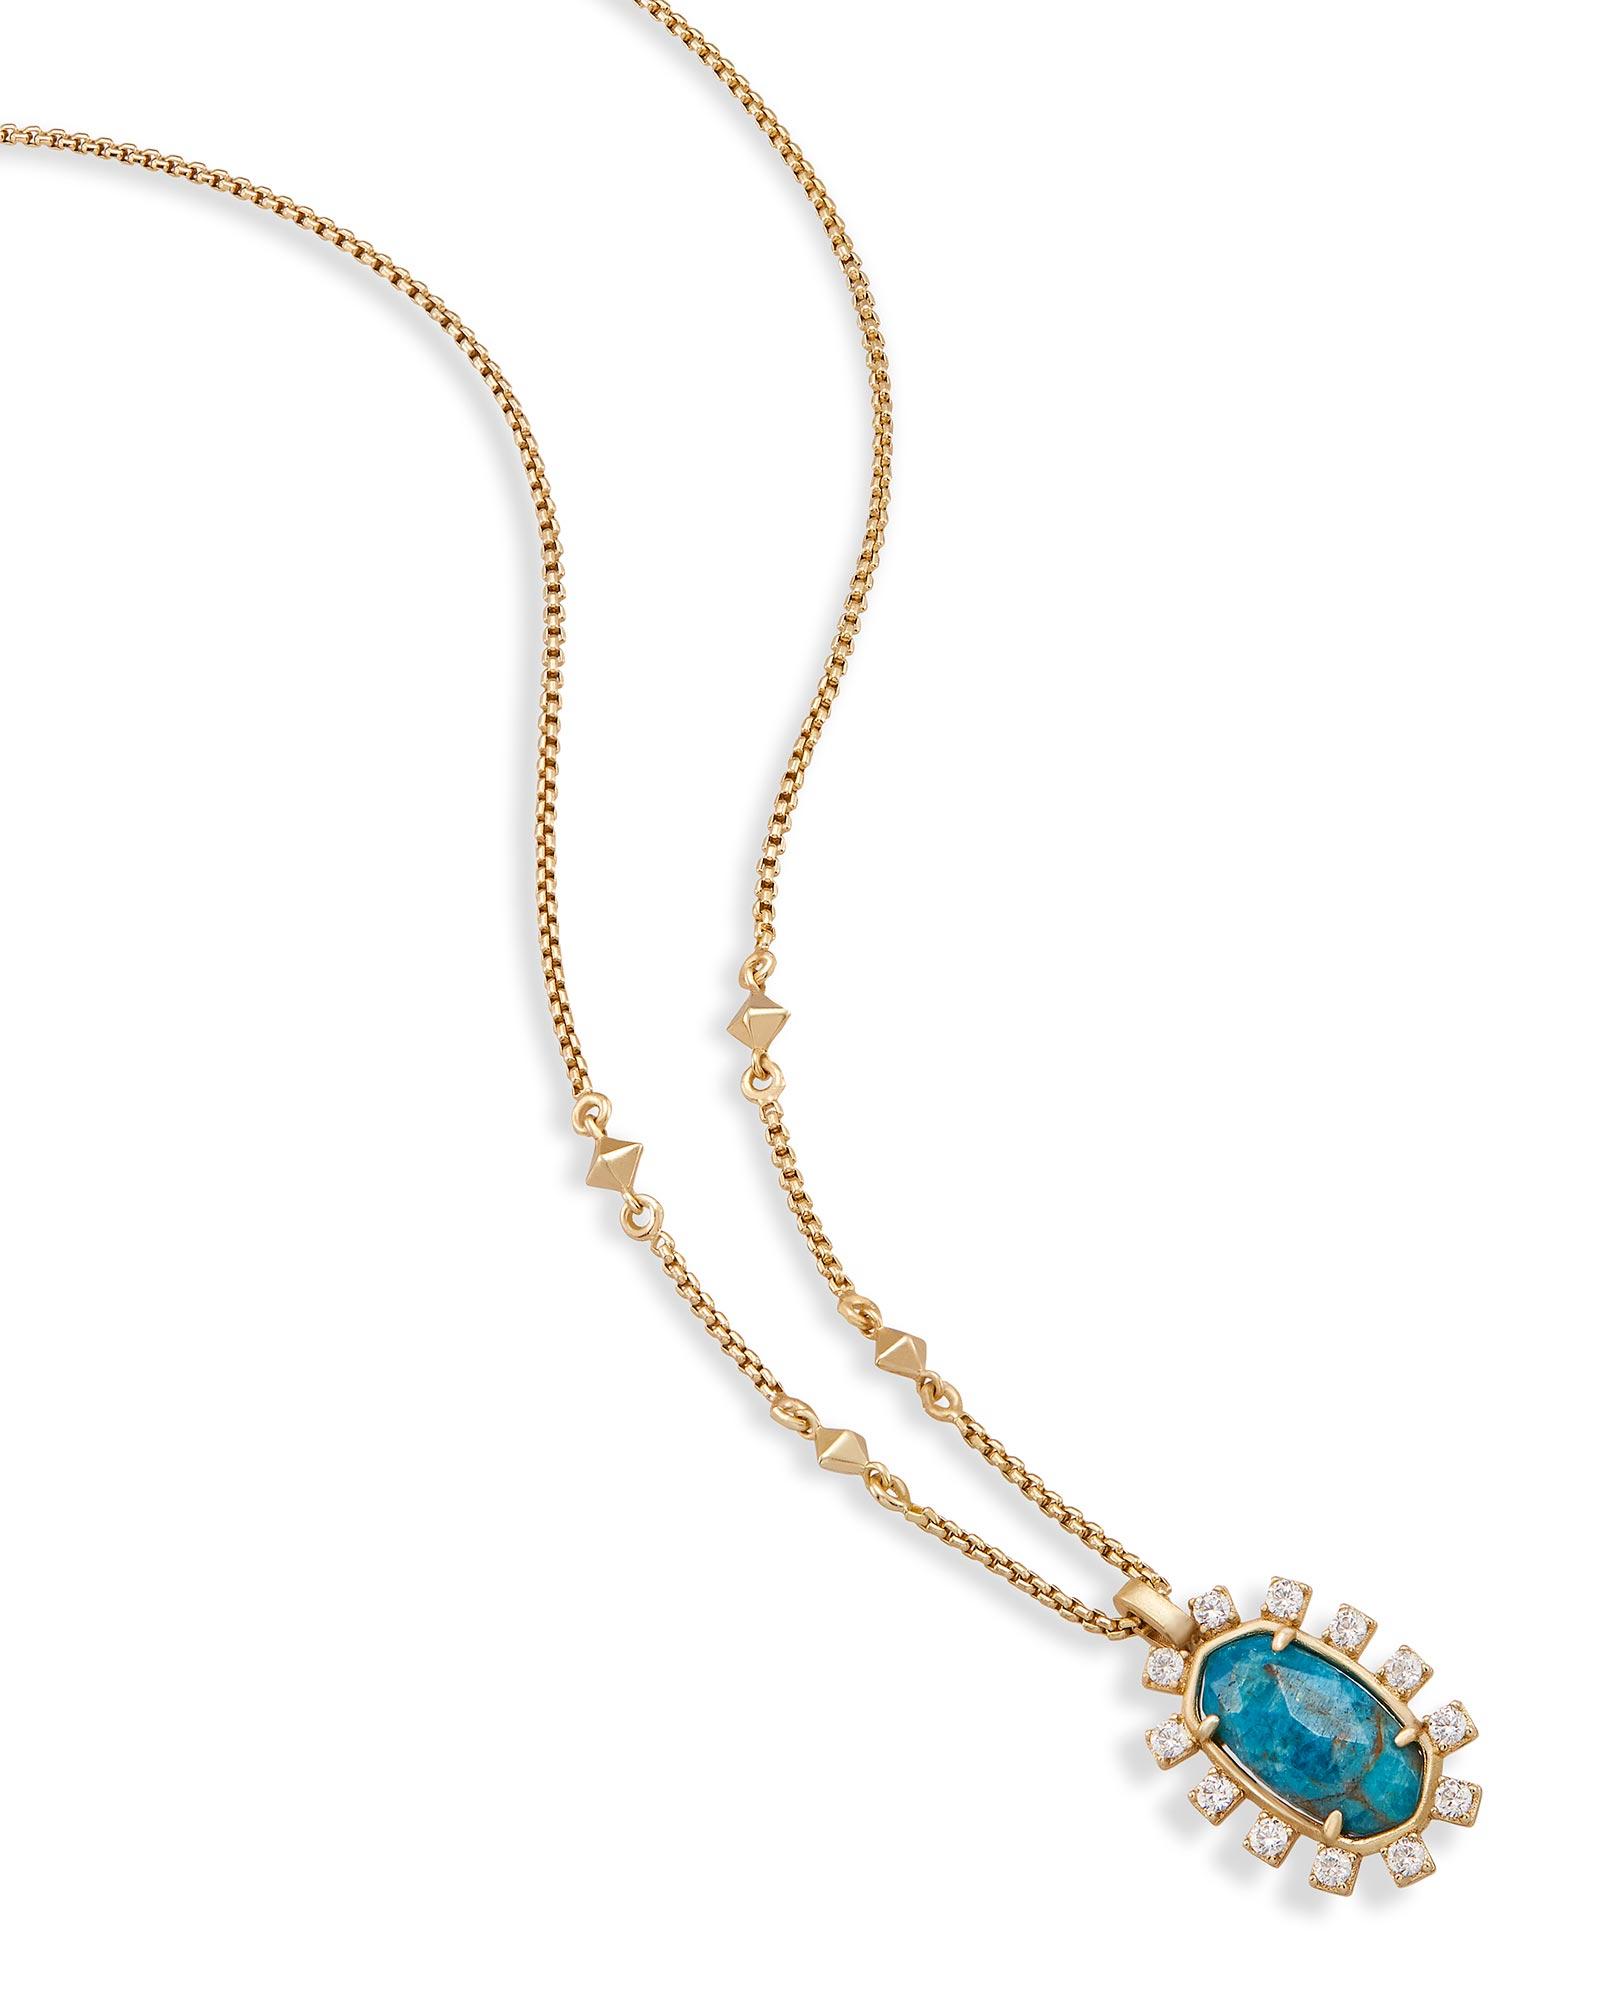 Brett Pendant Necklace in Aqua Apatite